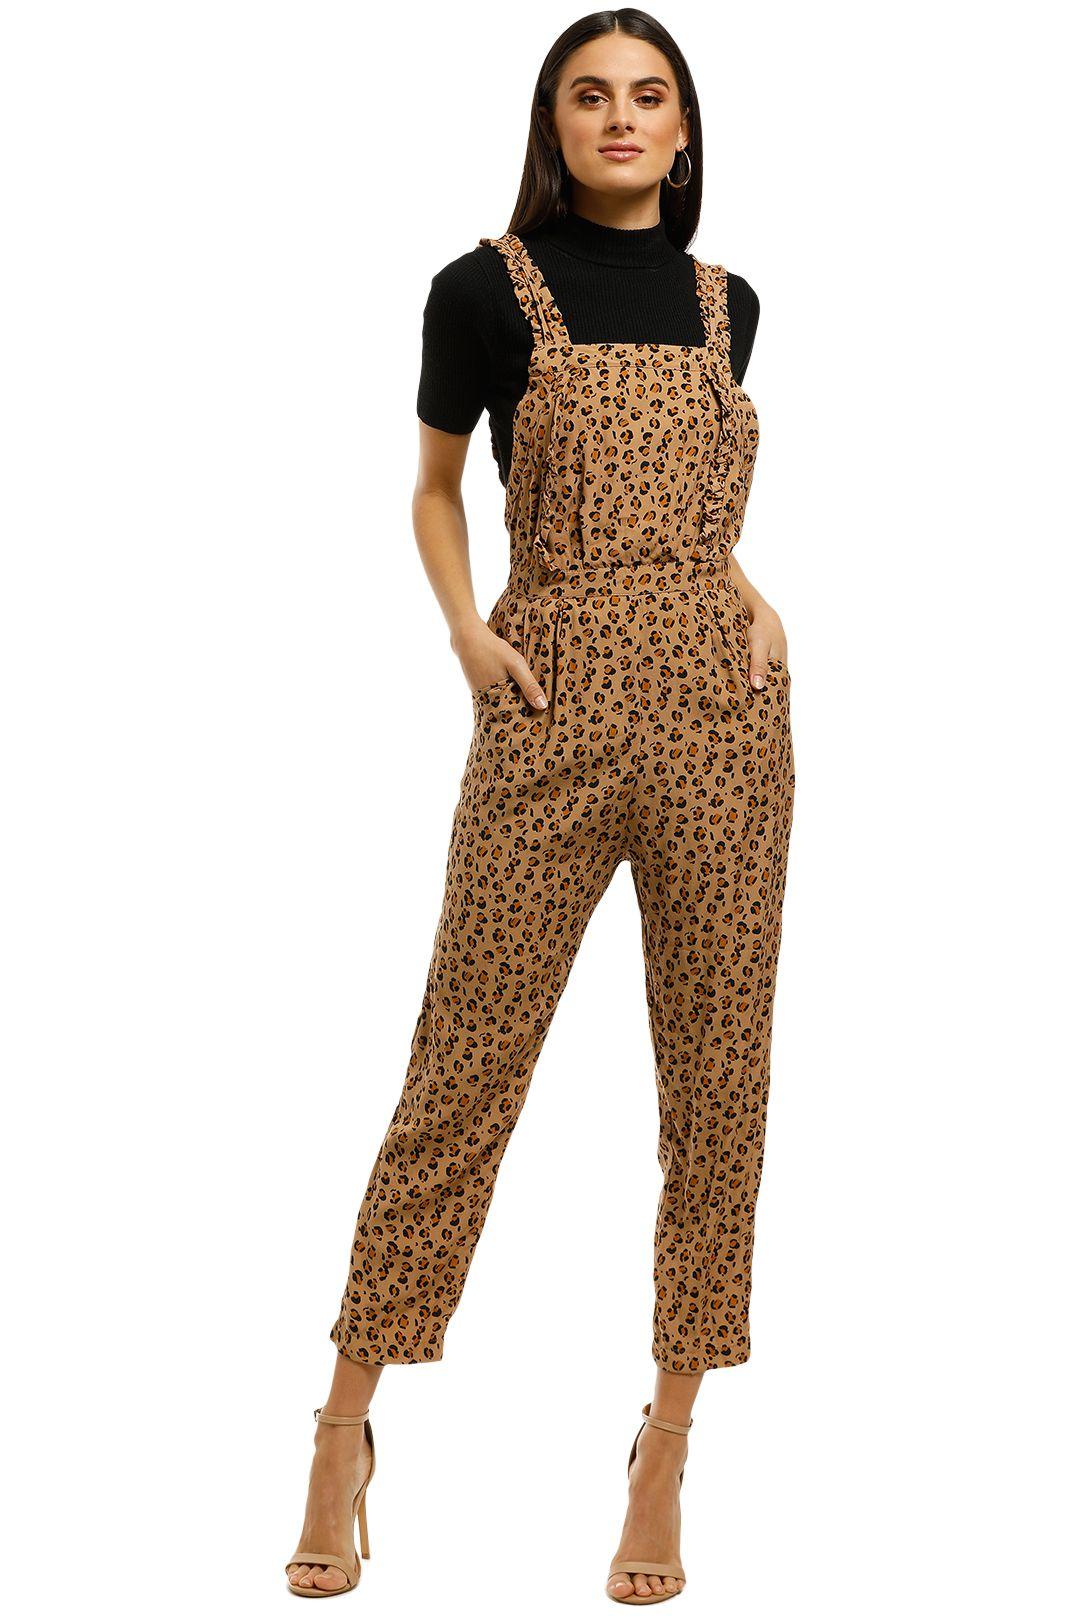 Rue-Stiic-Costello-Overall-Leopard-Front